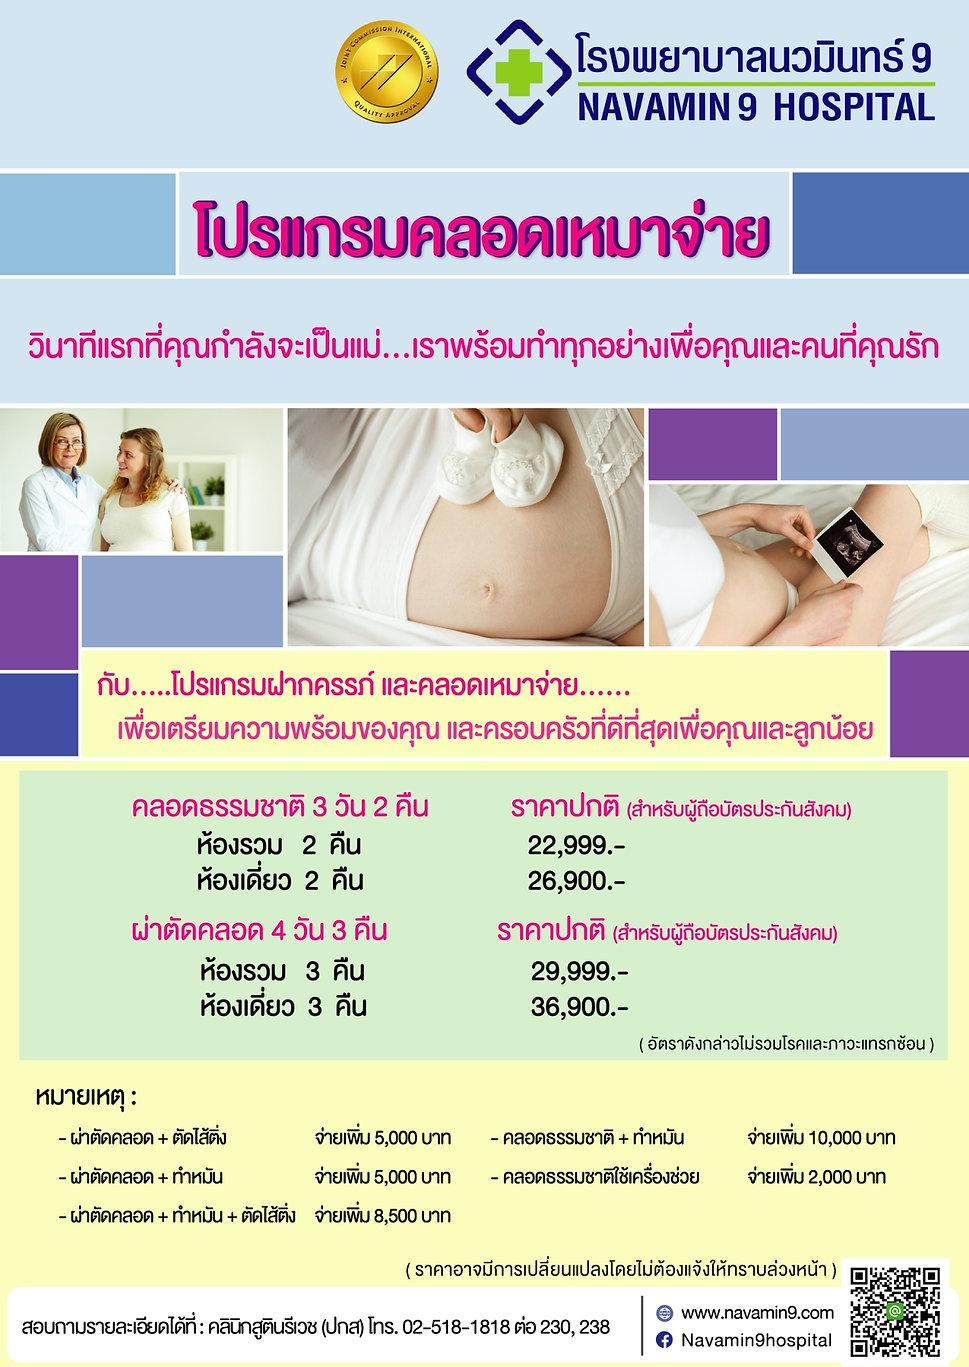 Sale Kit_๑๙๑๐๒๕_0032.jpg